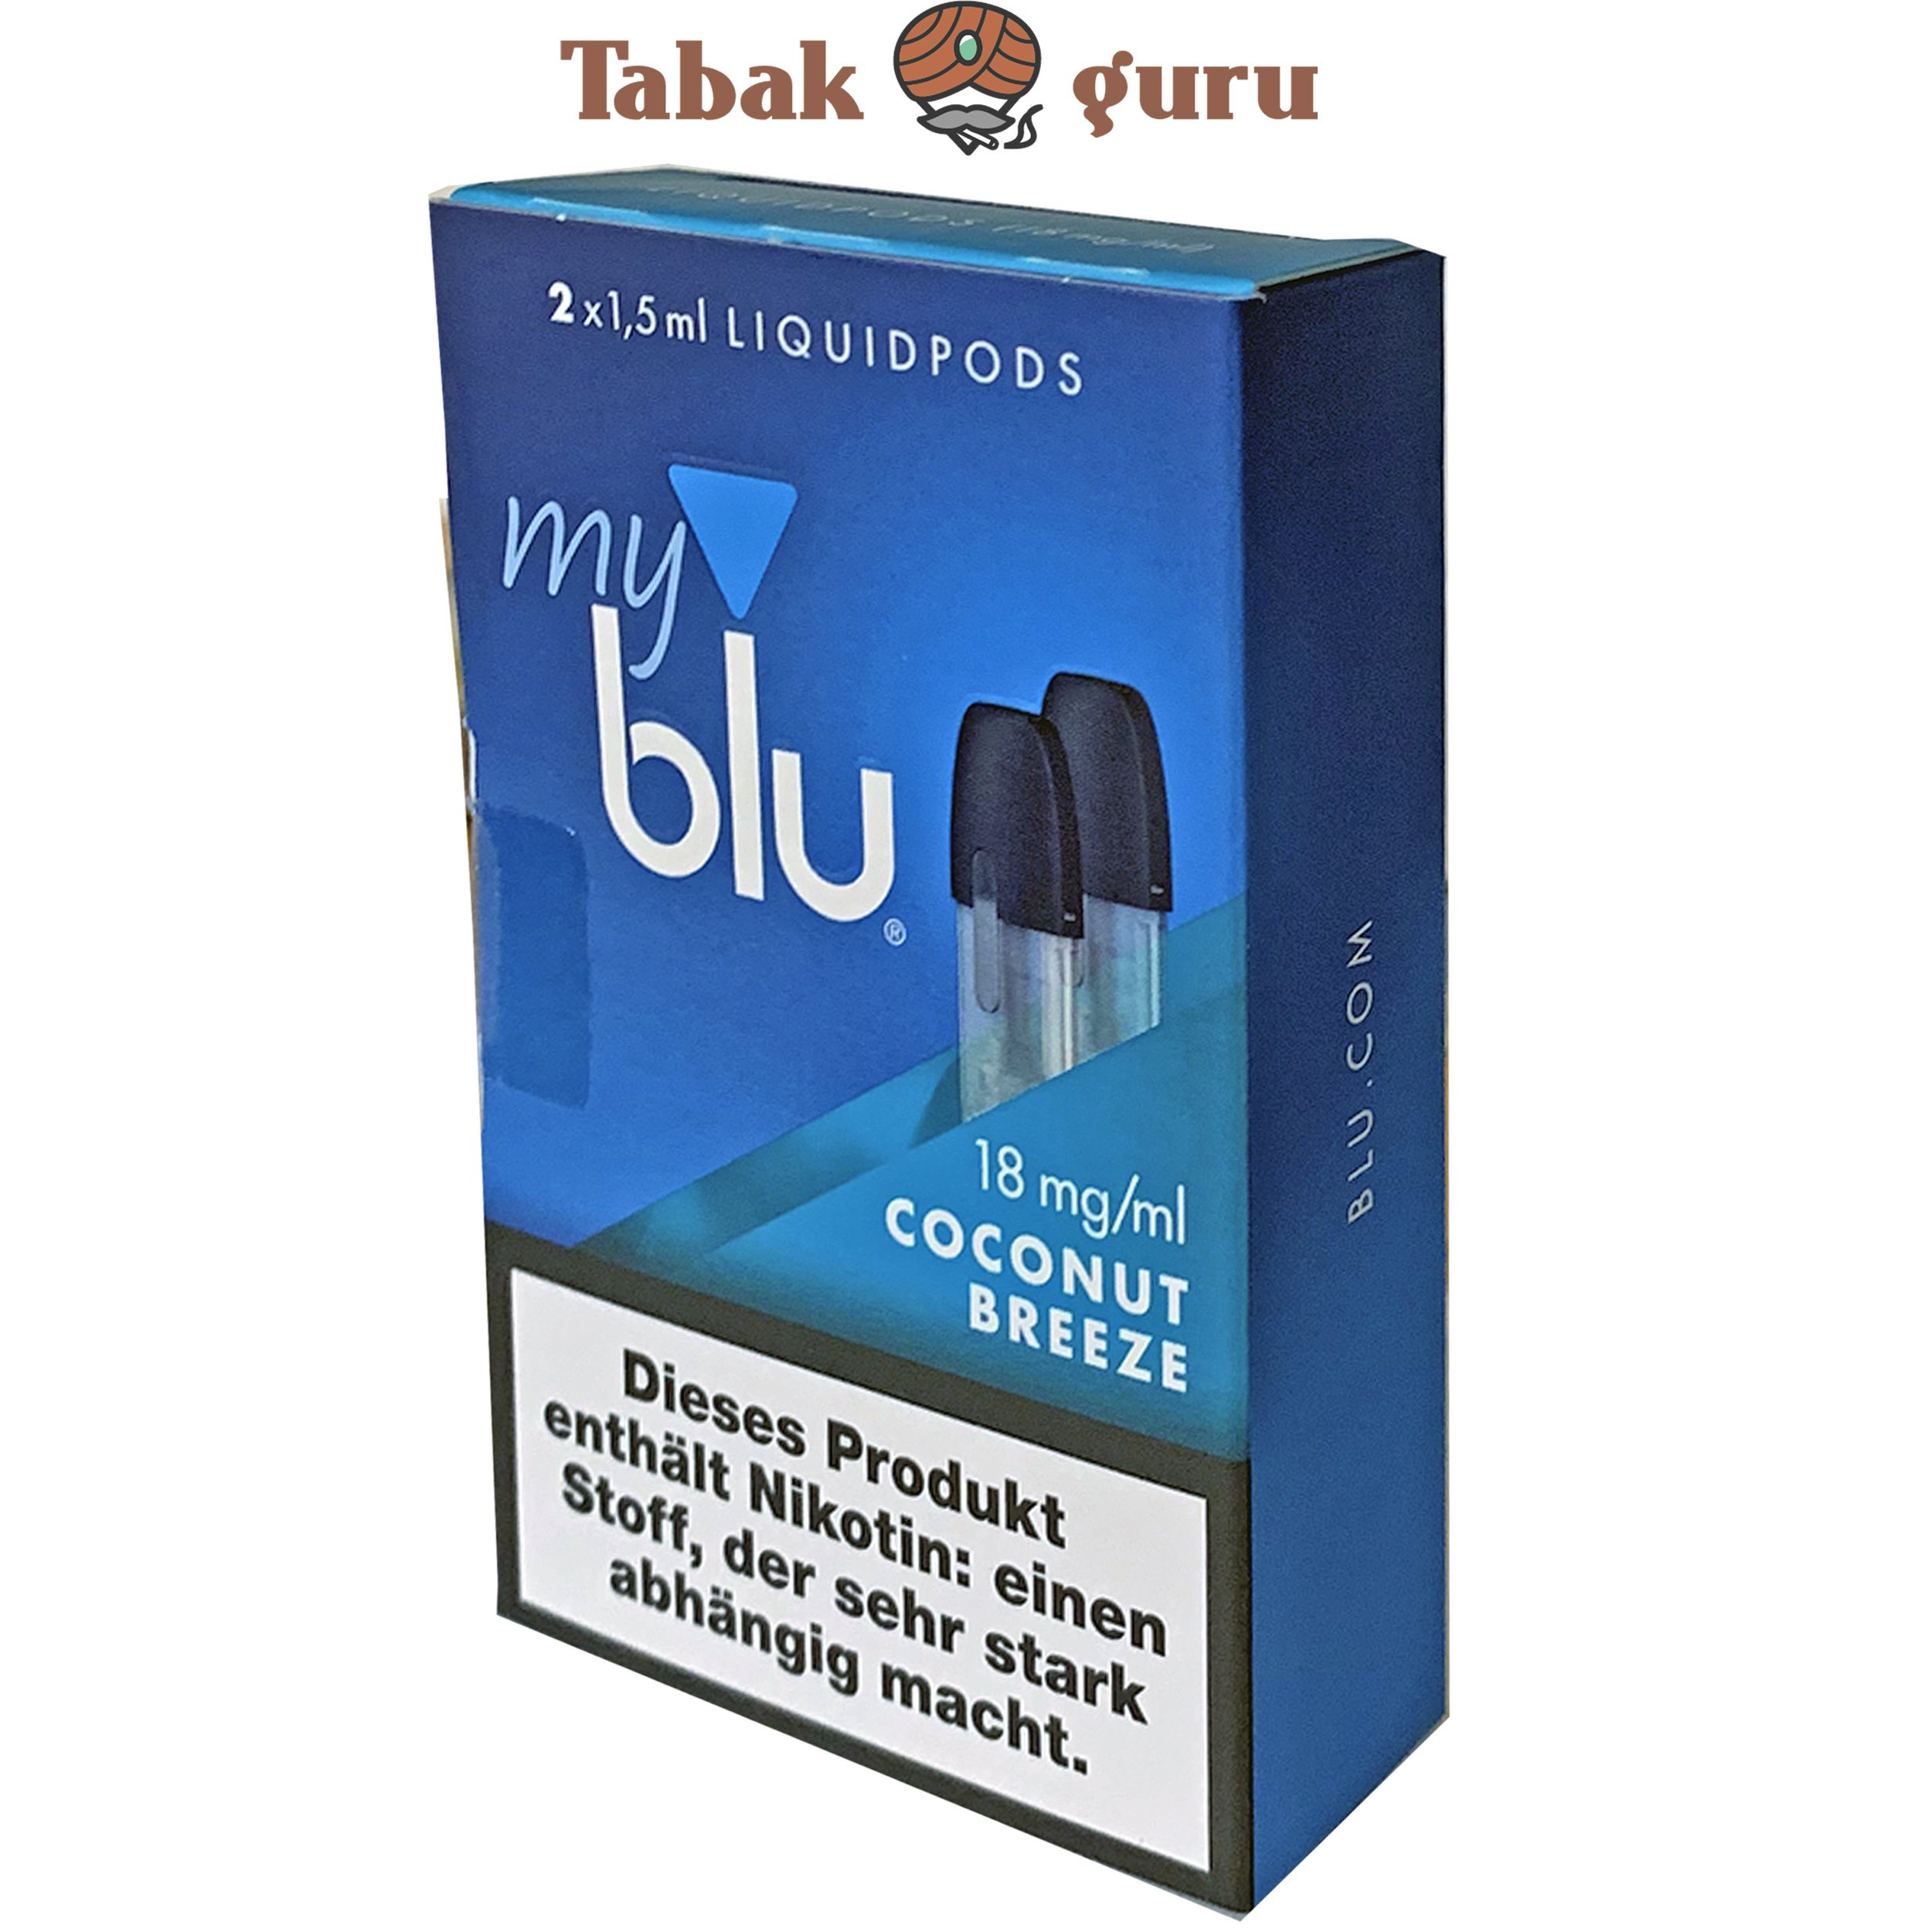 myblu Liquid Pods Coconut Breeze 18 mg/ml Nikotin